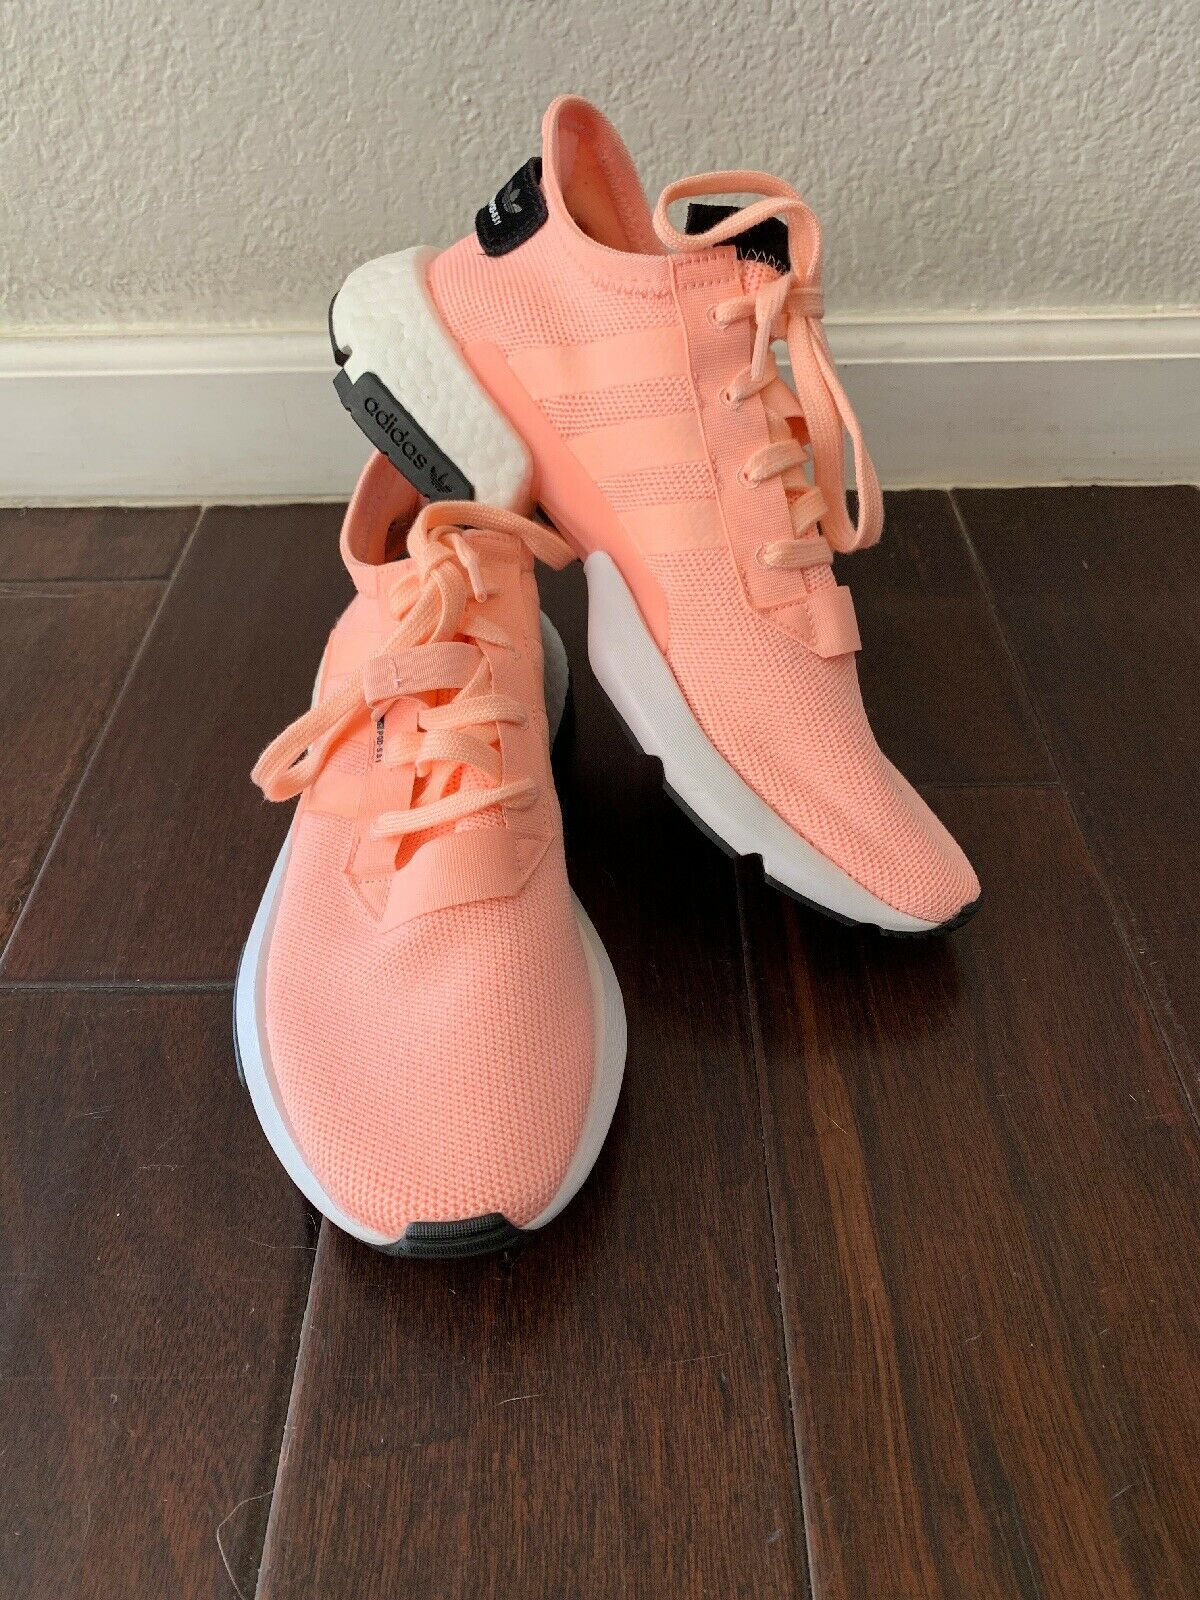 Adidas POD- S3.1 Sneaker, Mens, Size 9, orange